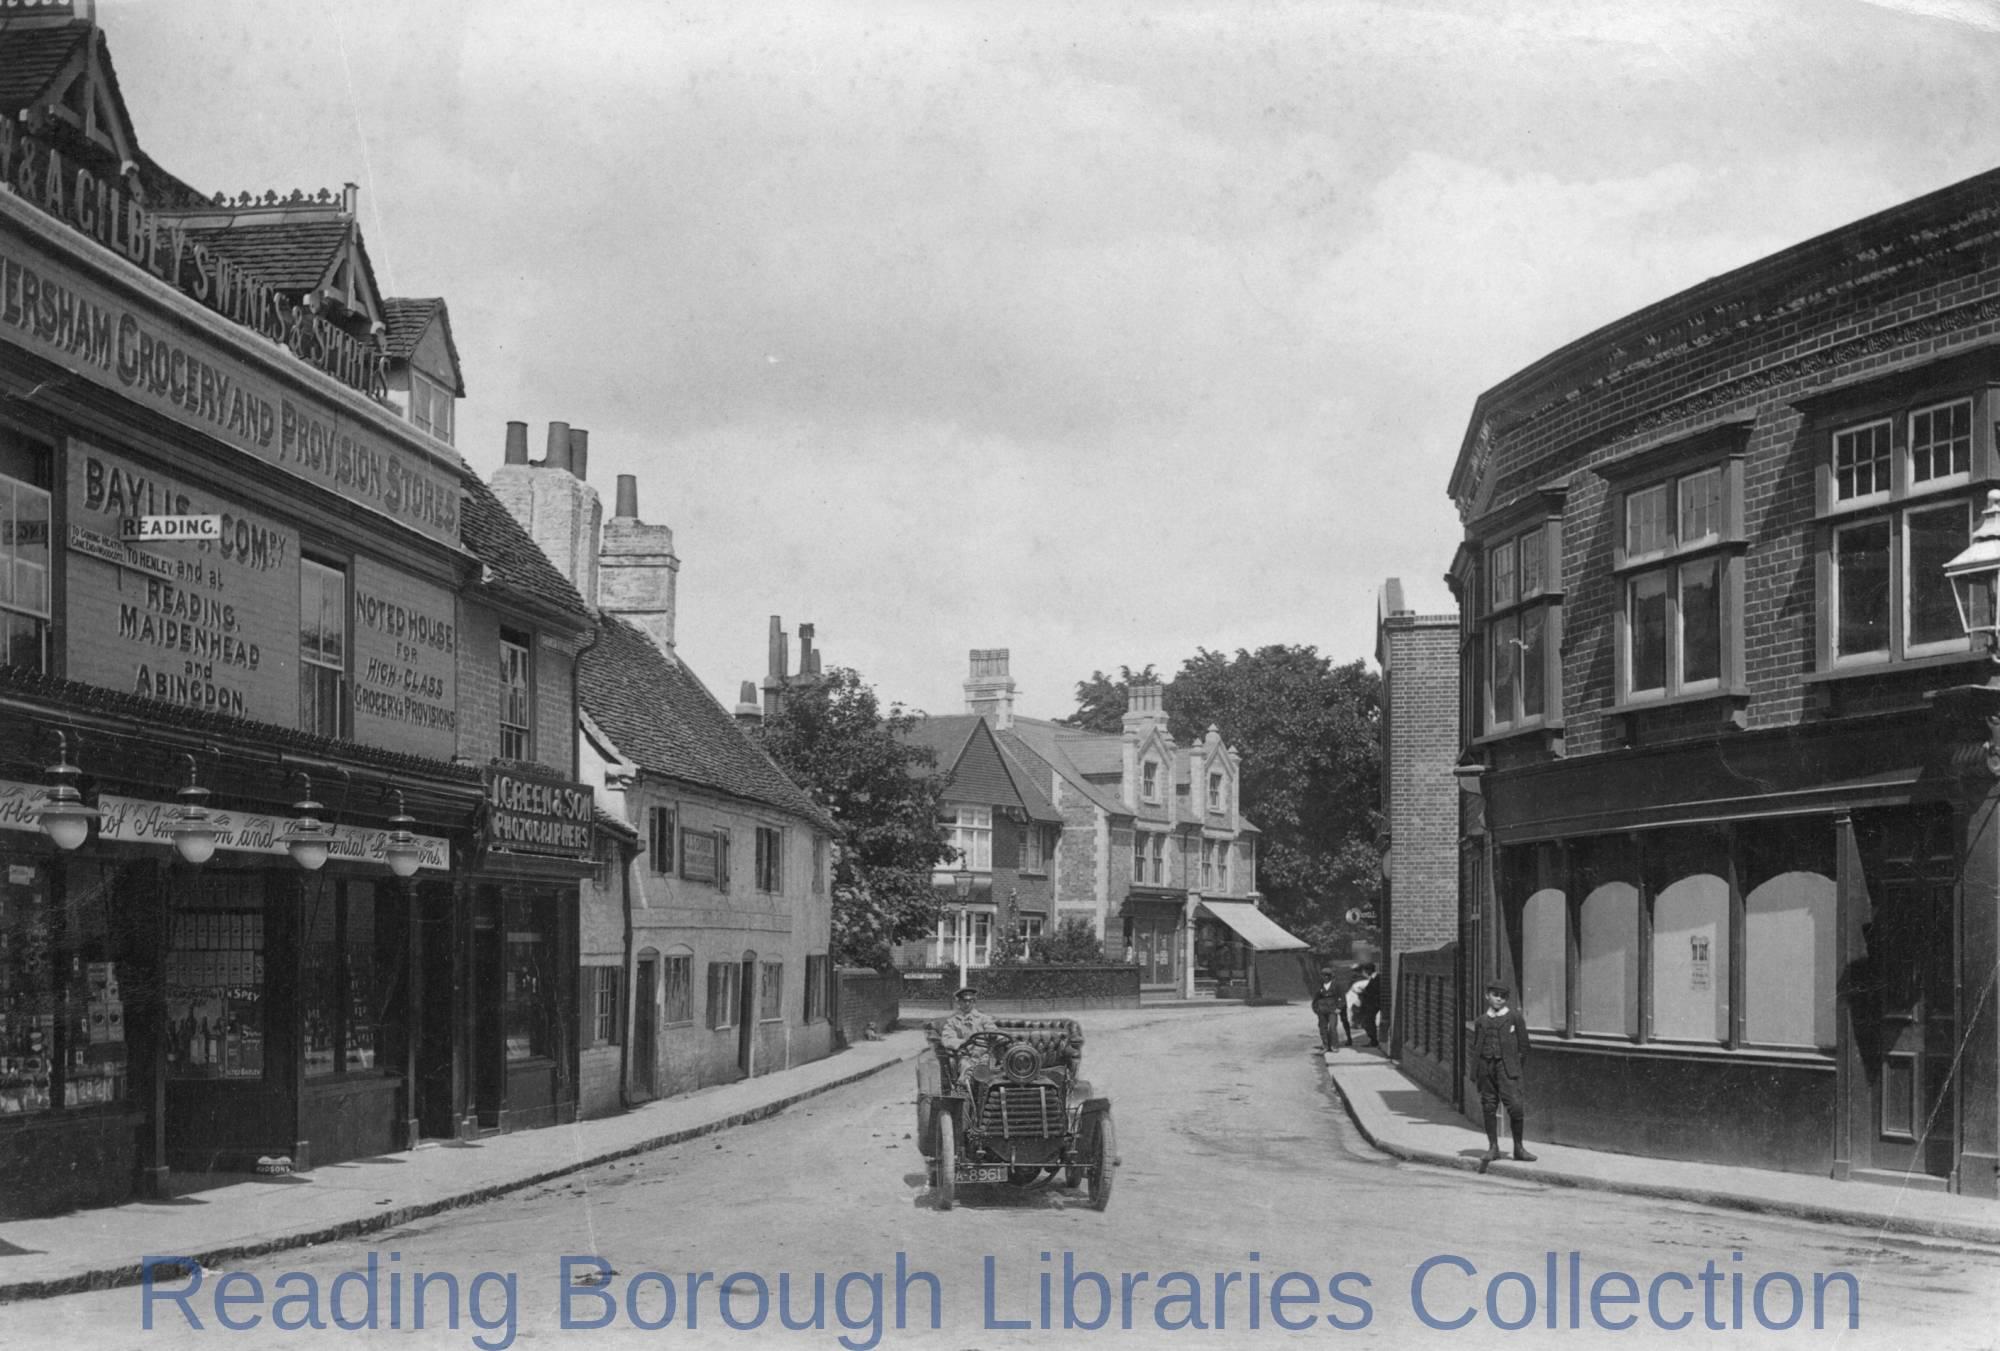 Church Street, Caversham, looking eastwards from the corner of Church Road and Bridge Street (Berry's Corner), 1908